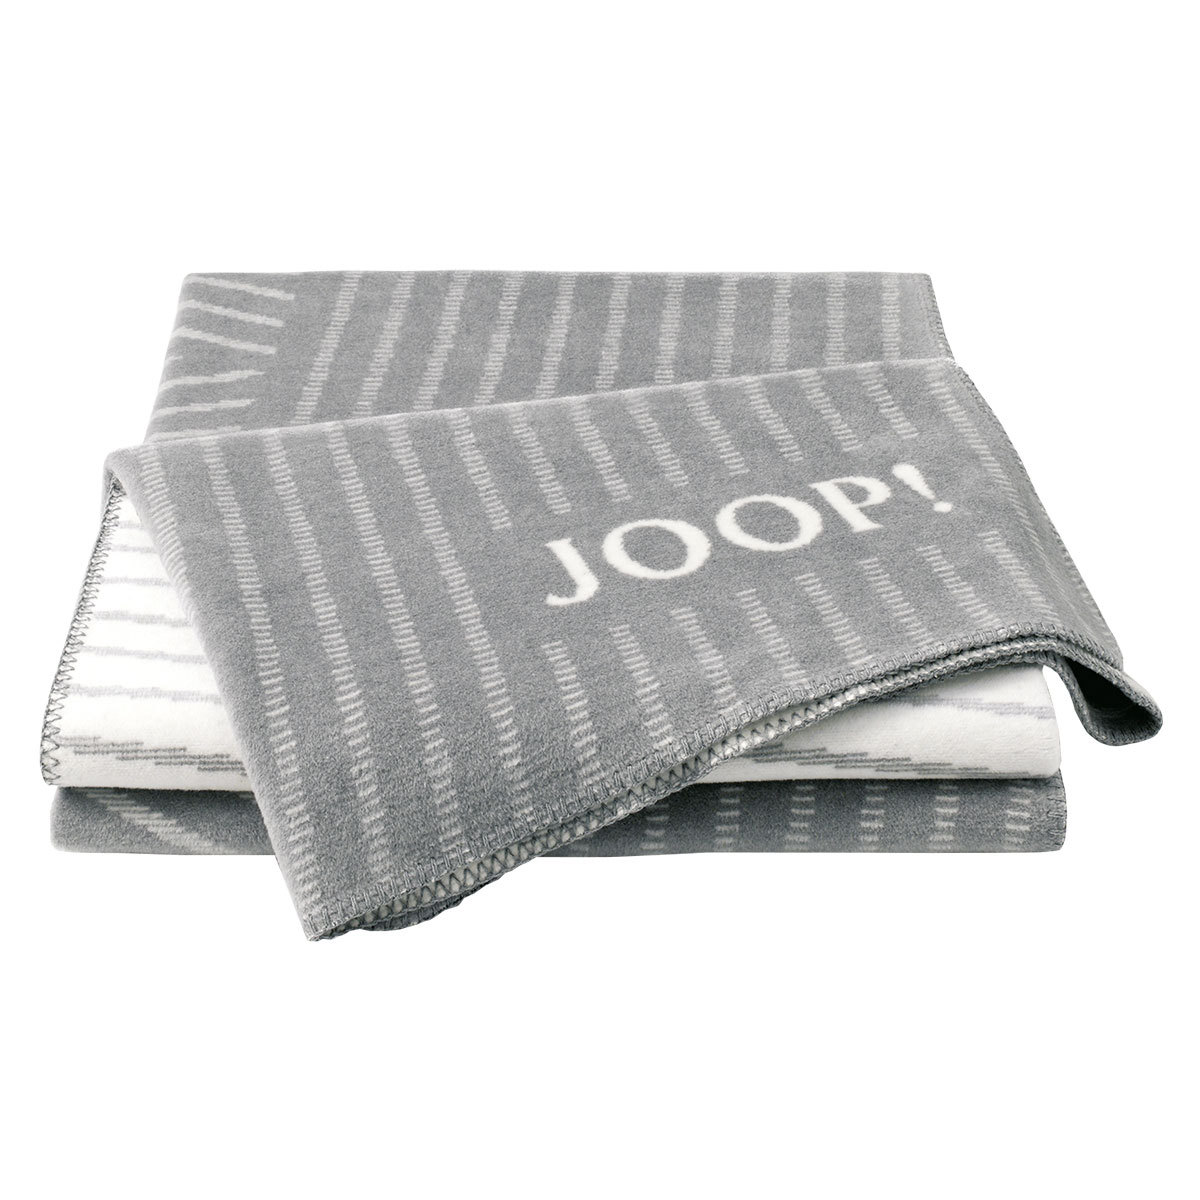 JOOP Wohndecke Cross Stripes Graphit-Ecru